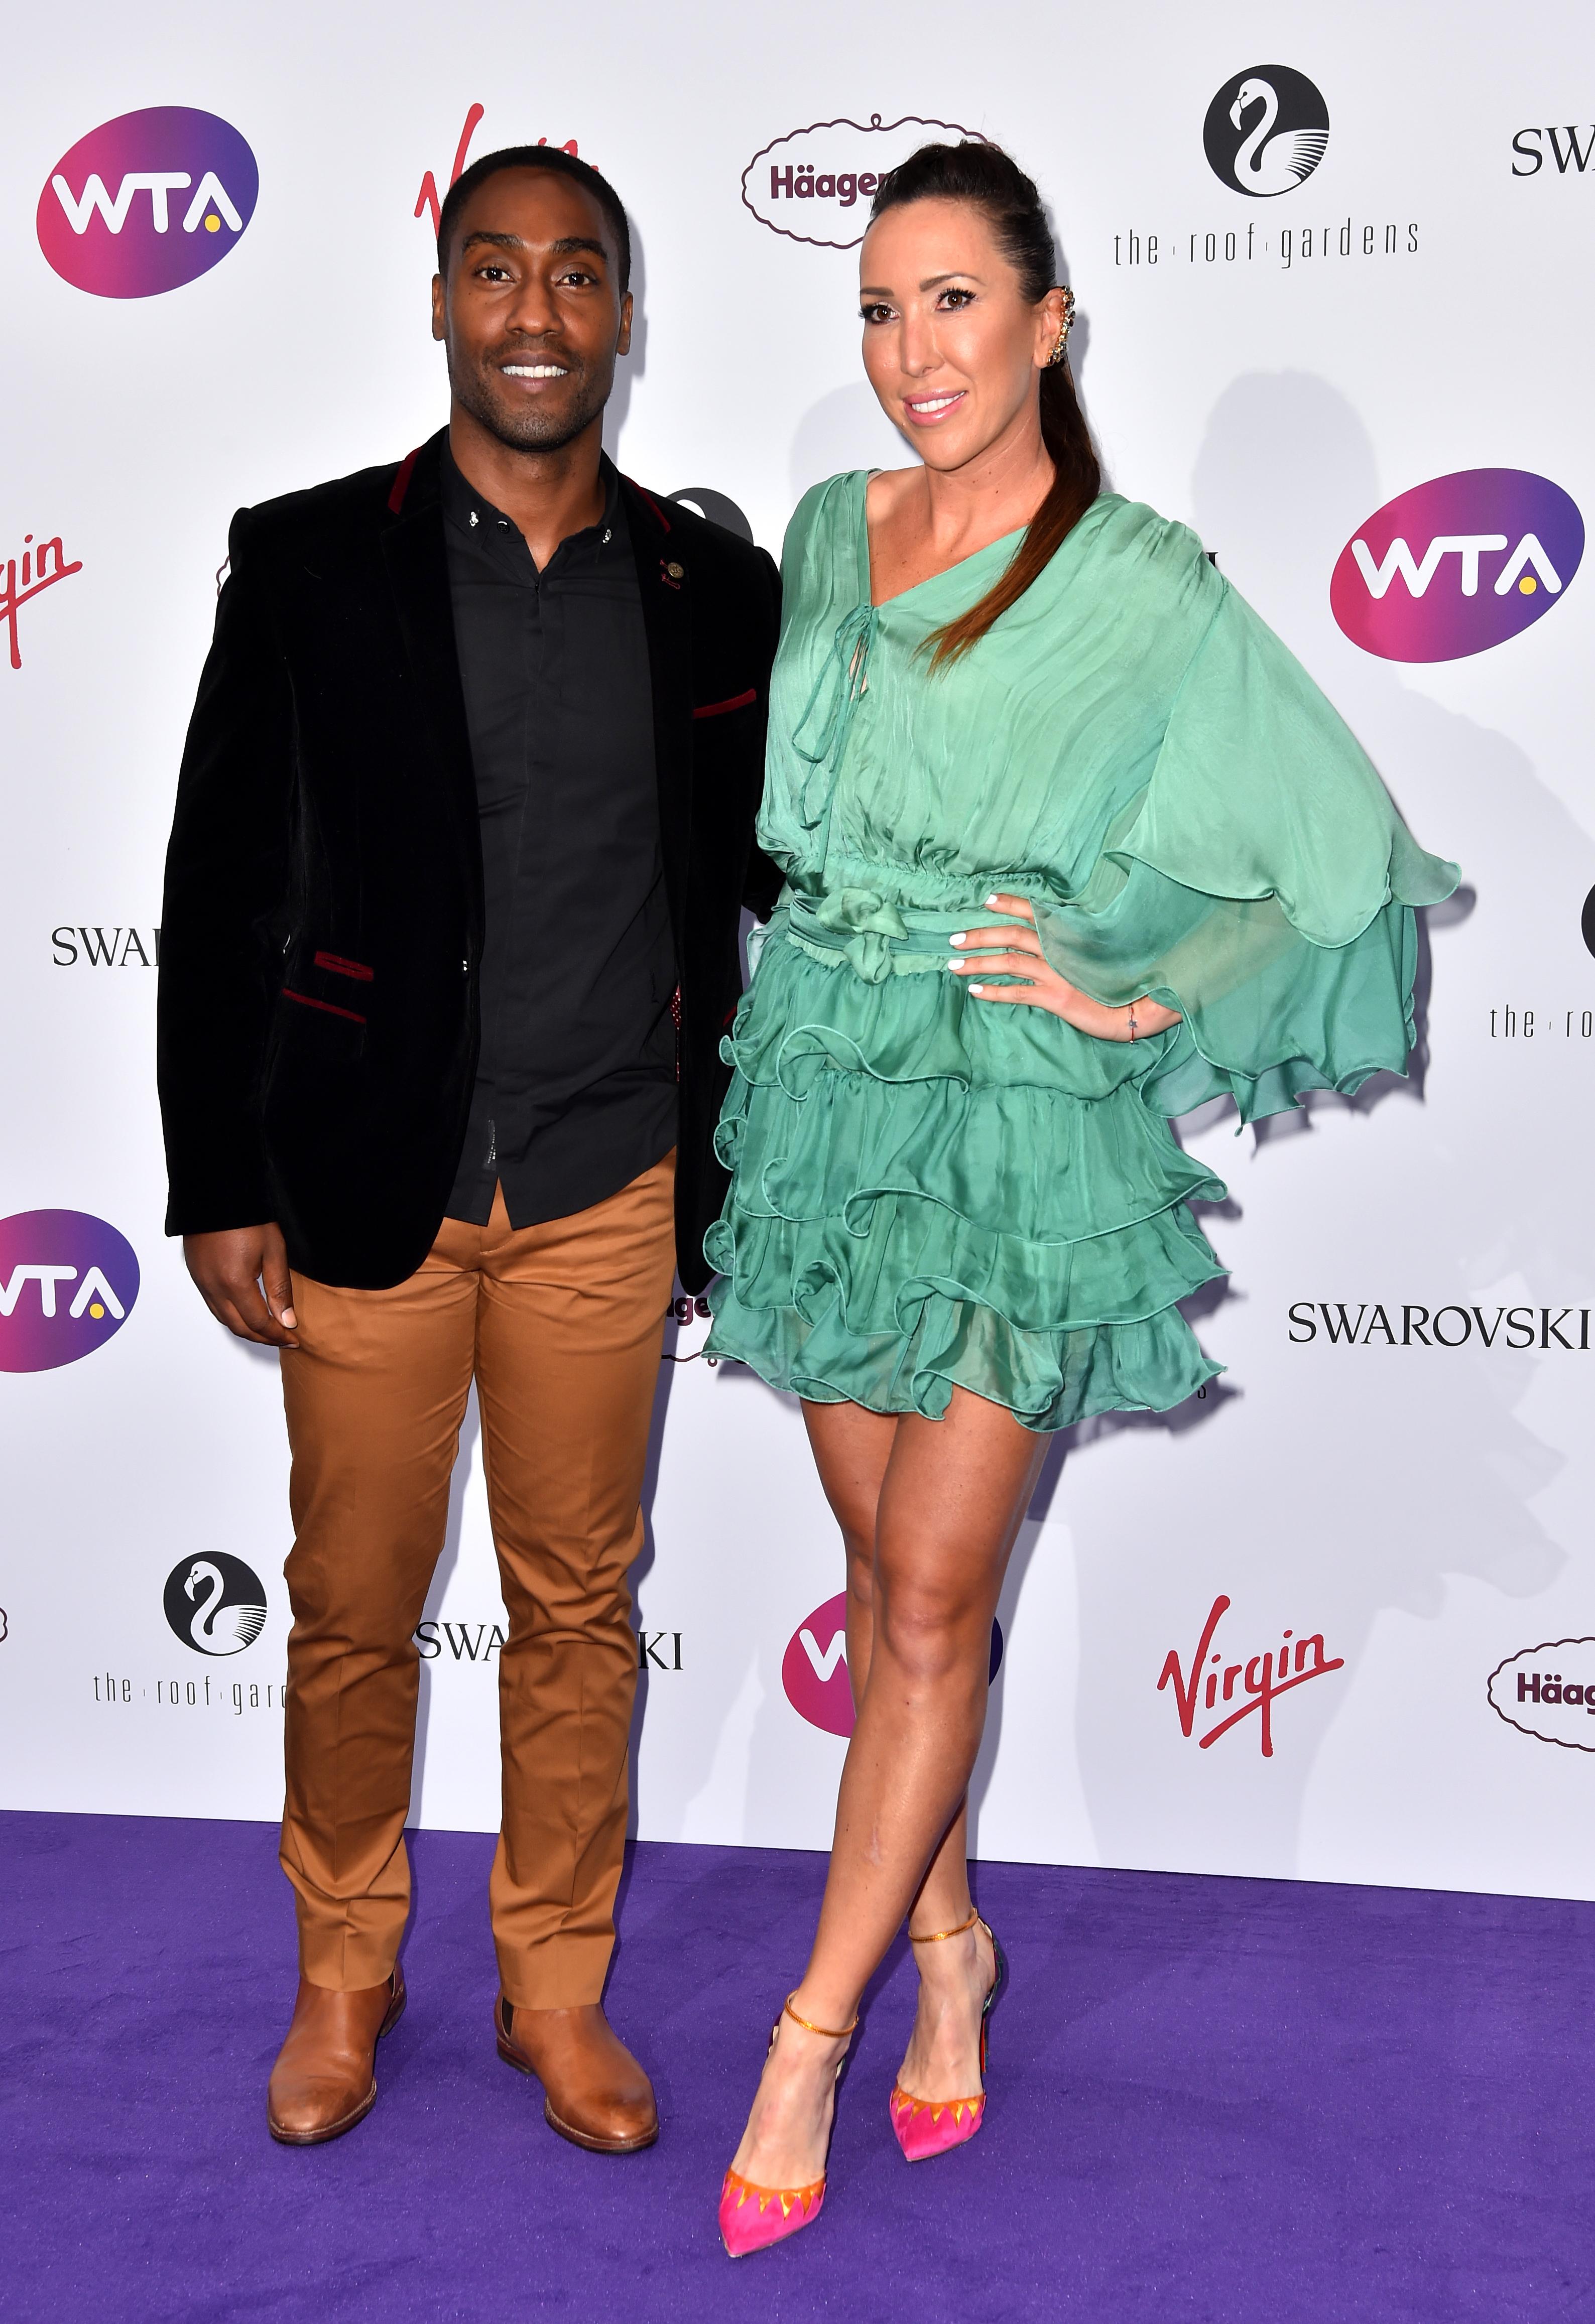 Tennis stars celebrate Wimbledon at WTA party | Bailiwick Express